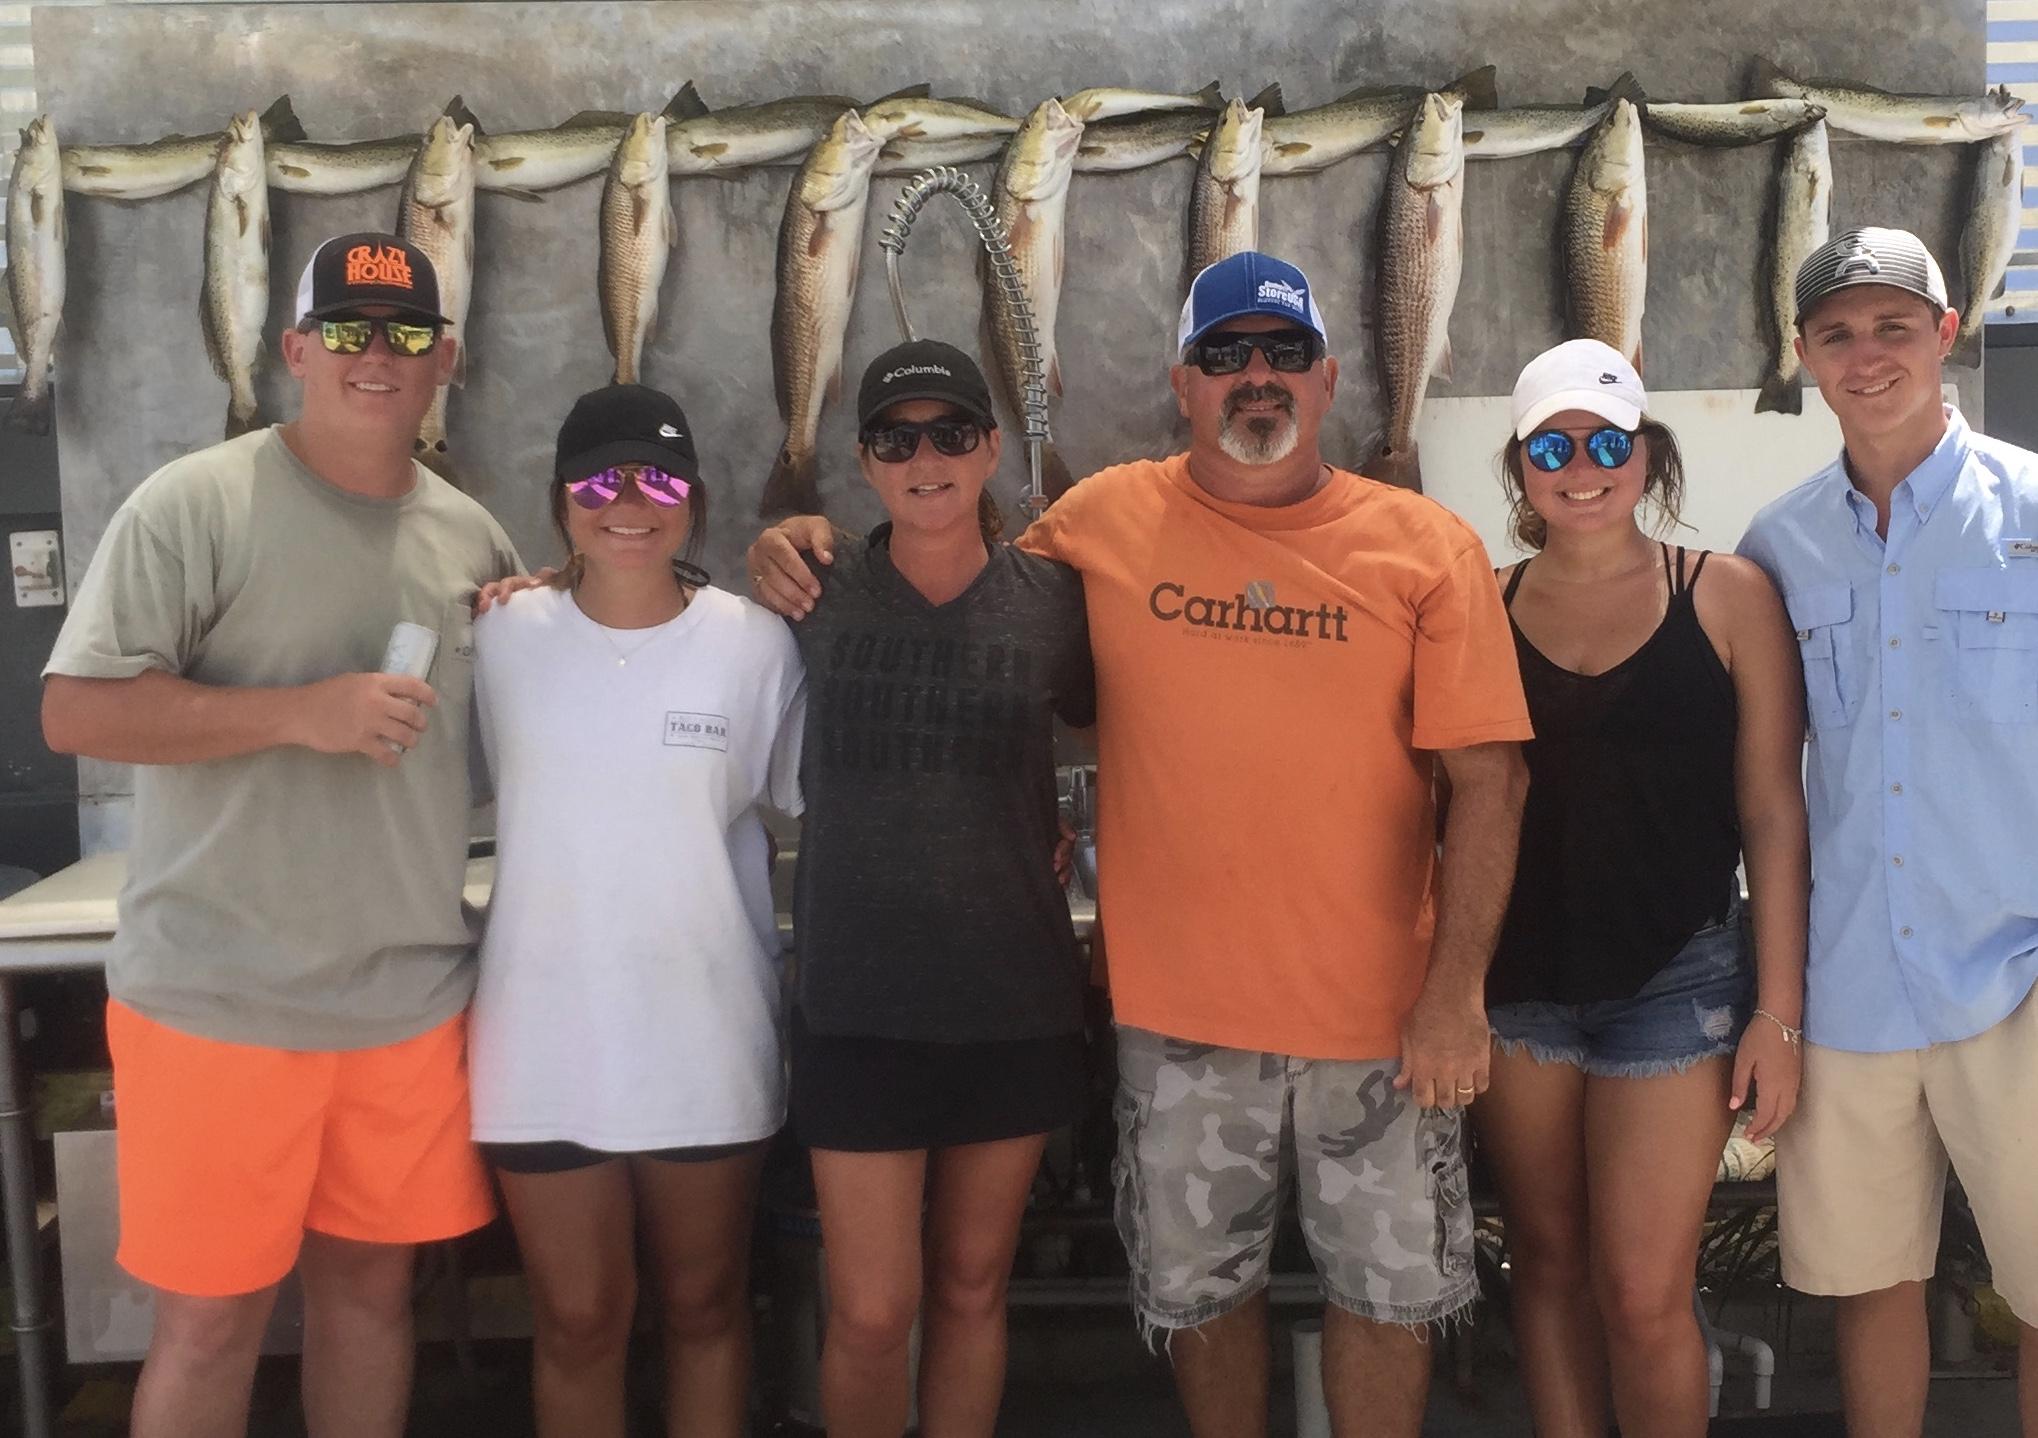 Destin inshore fishing report 8 13 17 last cast charters for Inshore fishing destin fl